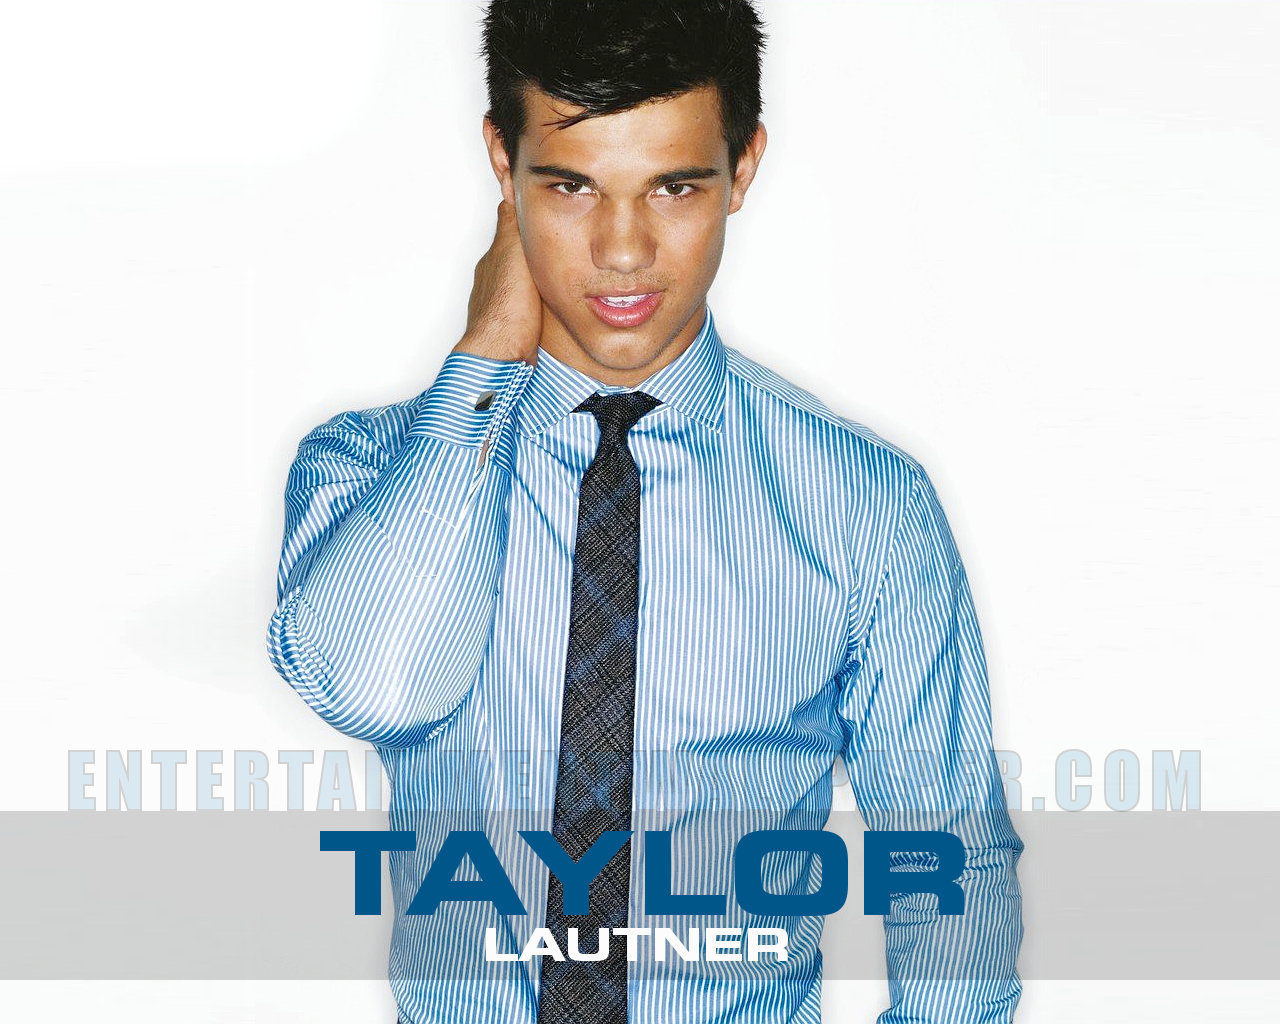 Taylor Lautner - Taylor Lautner Wallpaper (12054479) - Fanpop Taylor Lautner